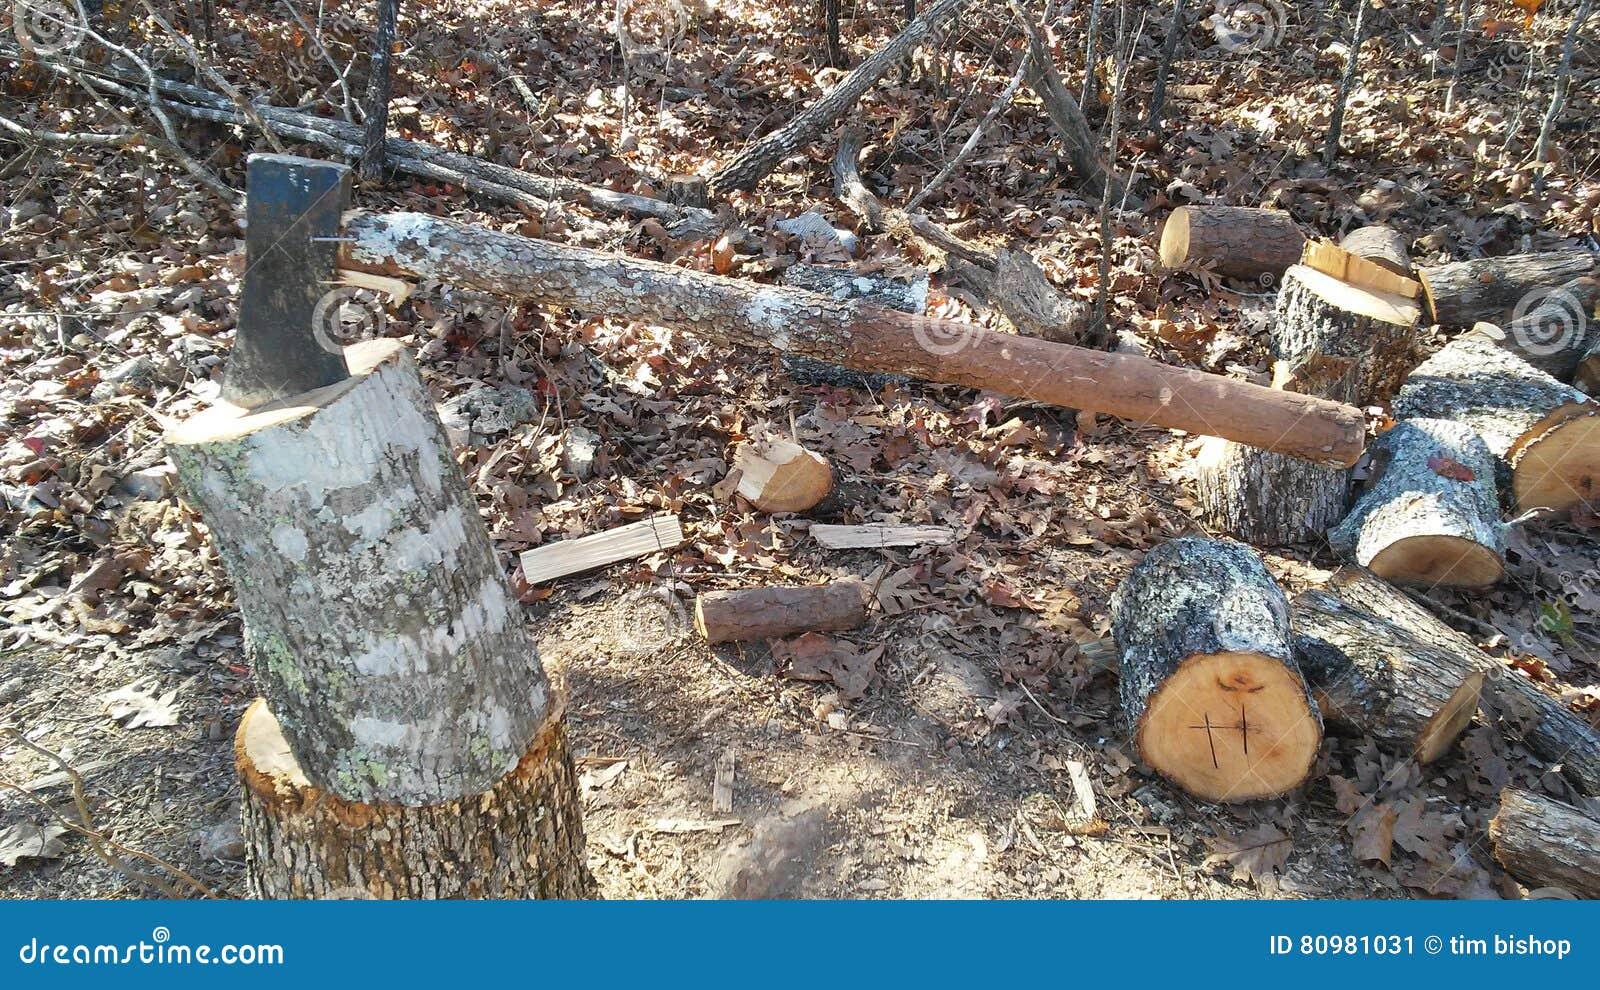 Axe with homemade oak handle